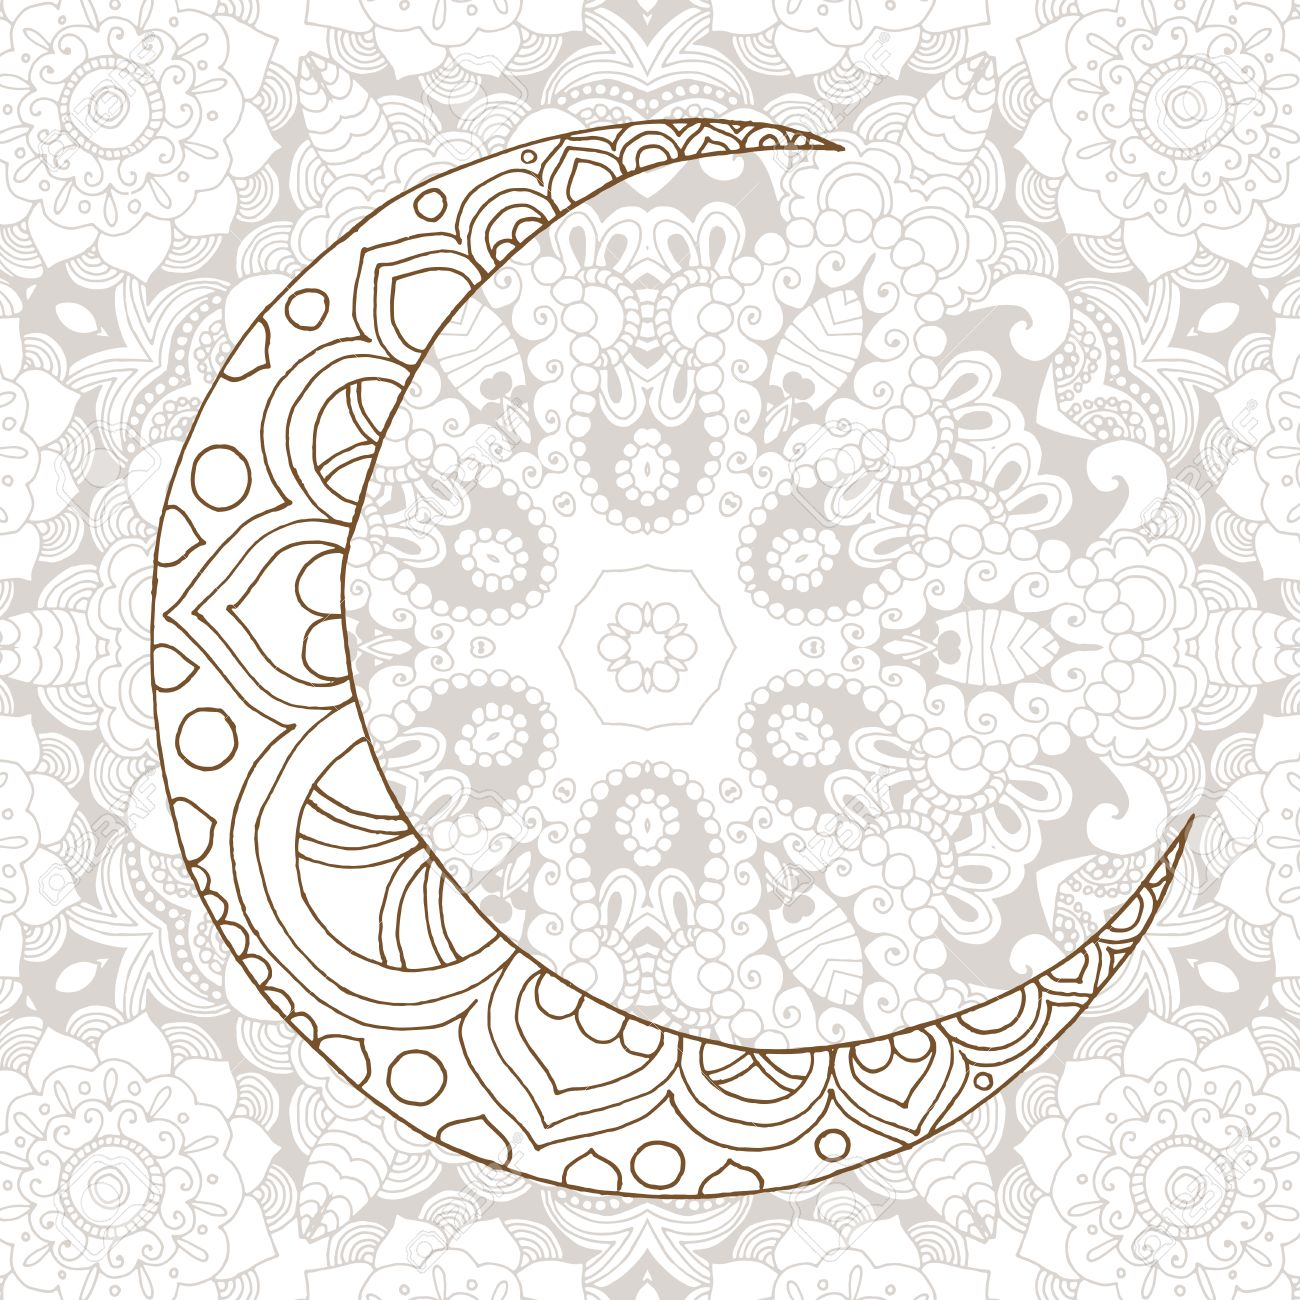 Coloring pages ramadan - Ramadan Kareem Half Moon Design Background Greeting Design Coloring Page Engraved Vector Illustration